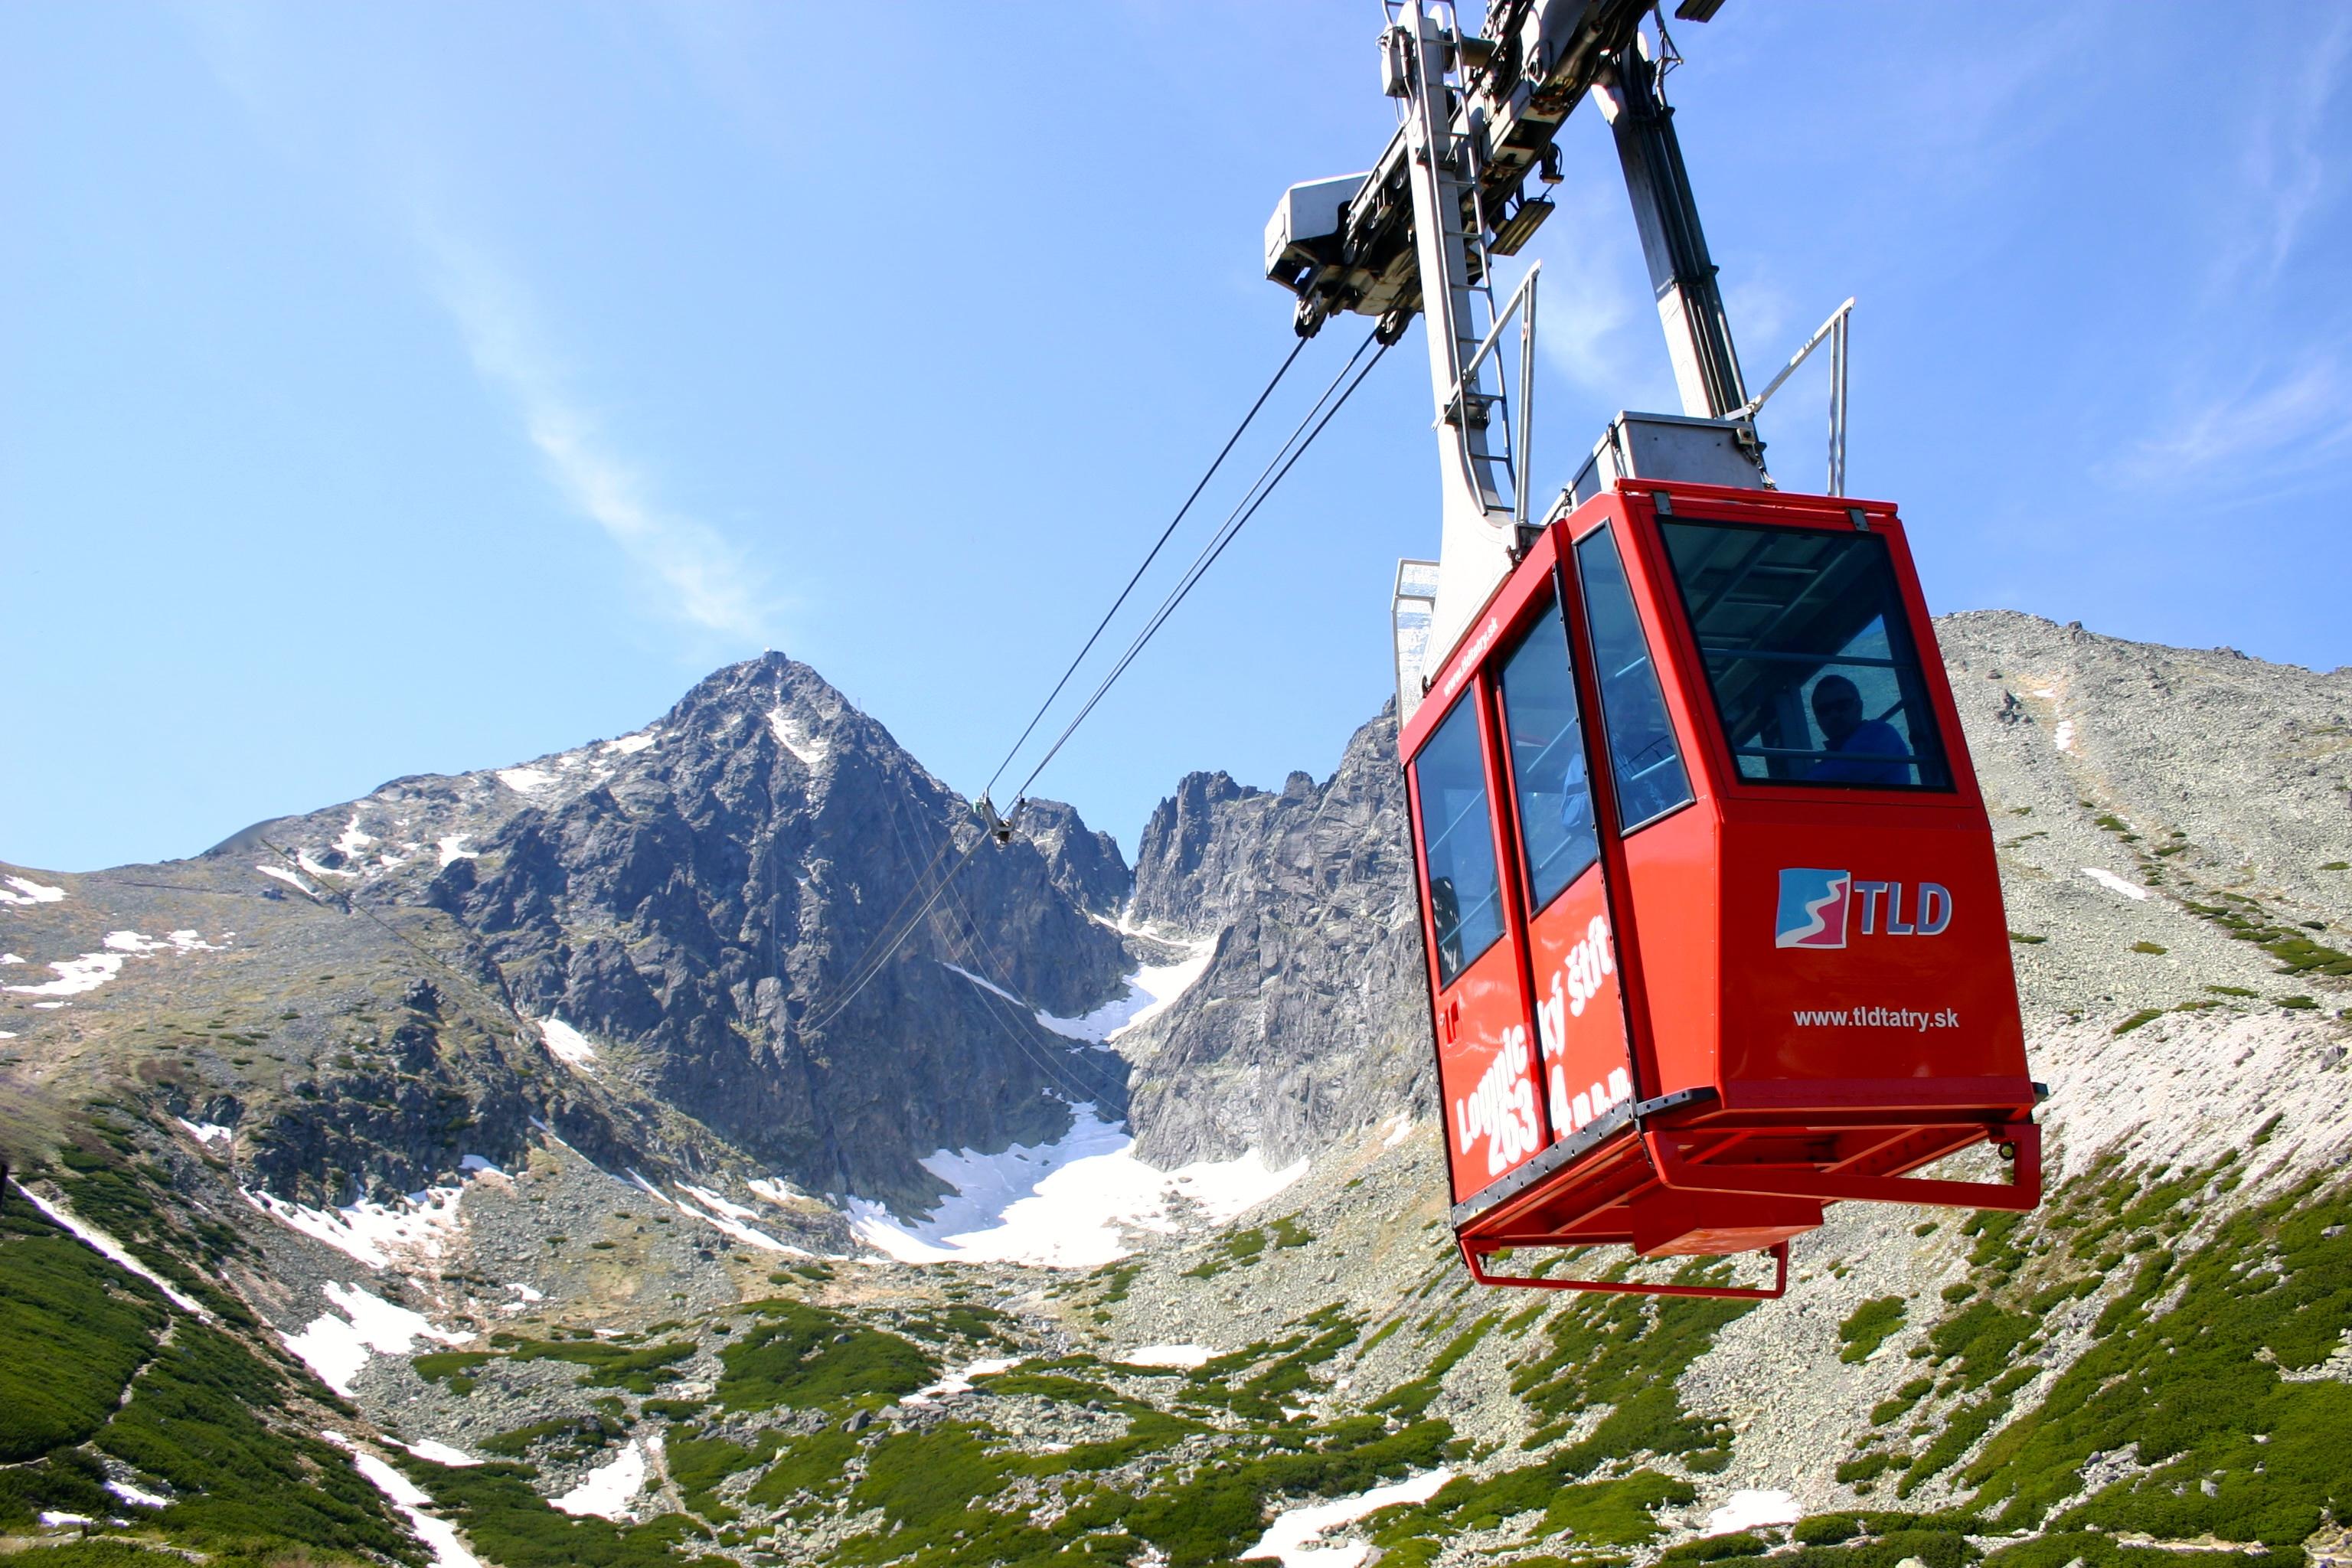 Kabínková lanovka na Lomnický štít - jedna z najväčších turistických atrakcií Vysokých Tatier.